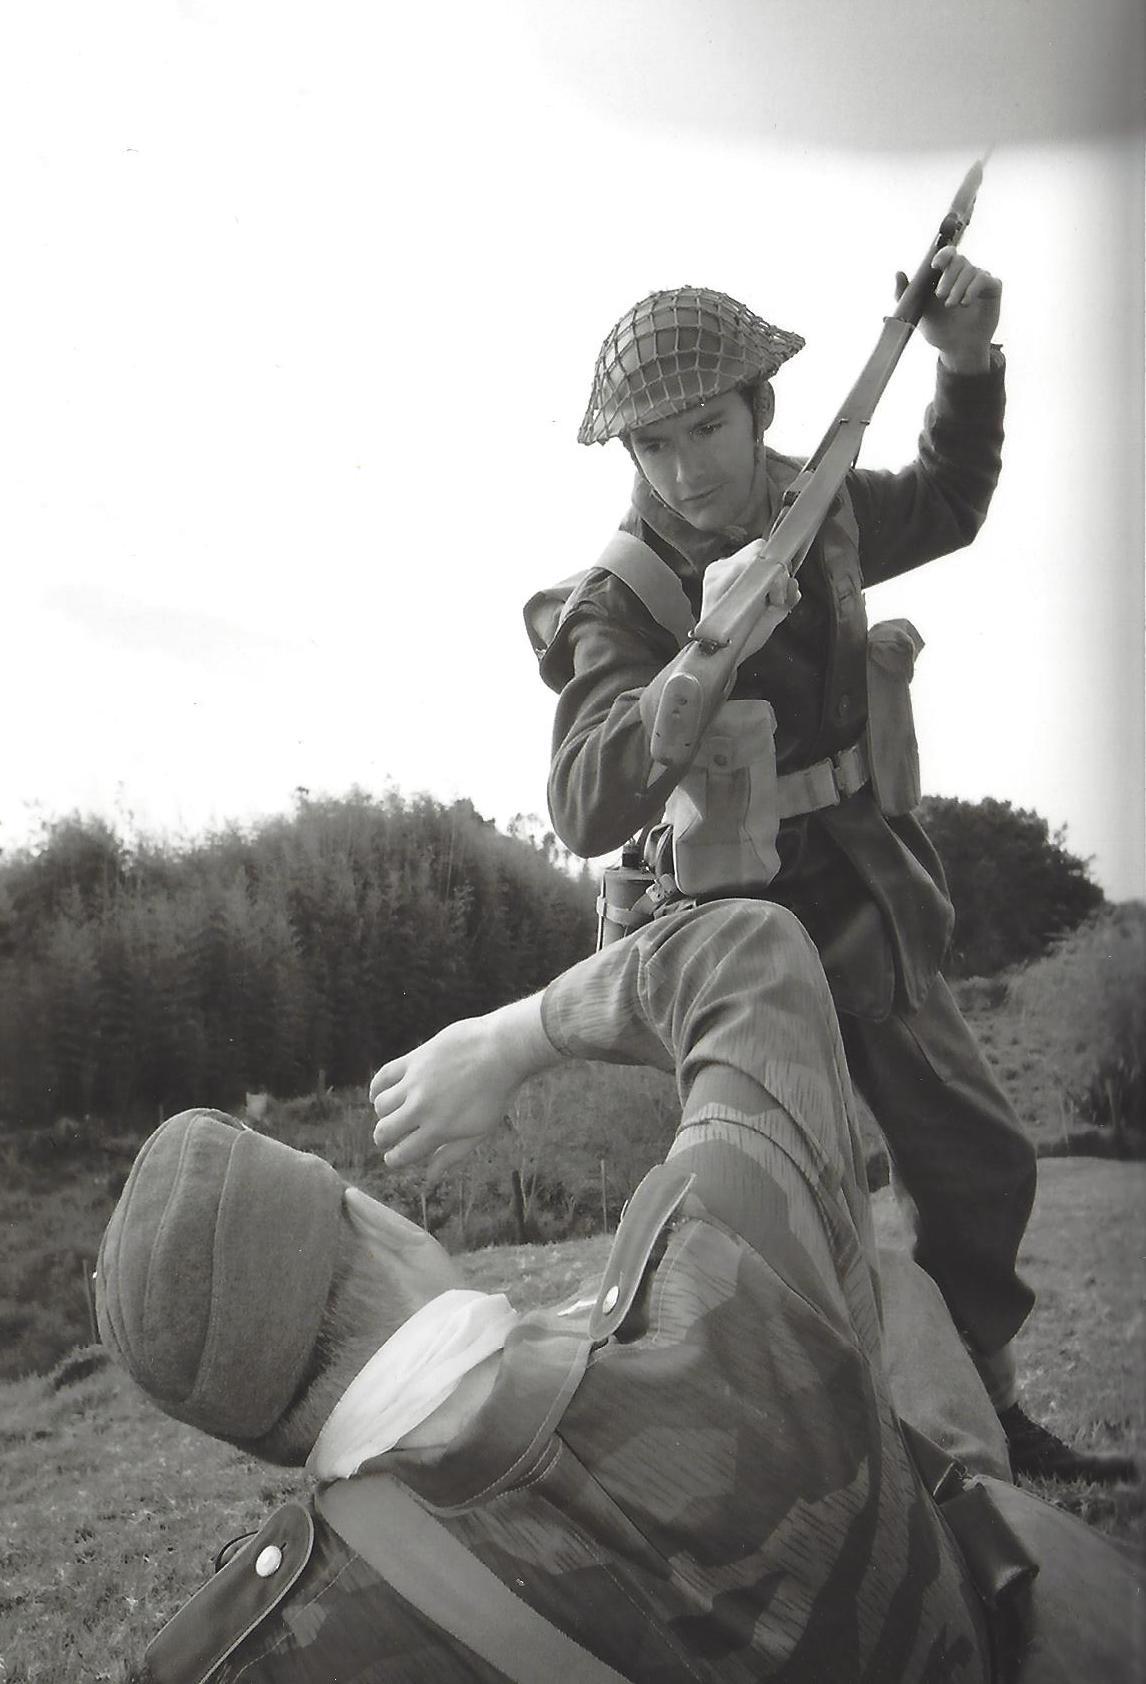 Close quarter battle as a kiwi clubs a fallen paratrooper.